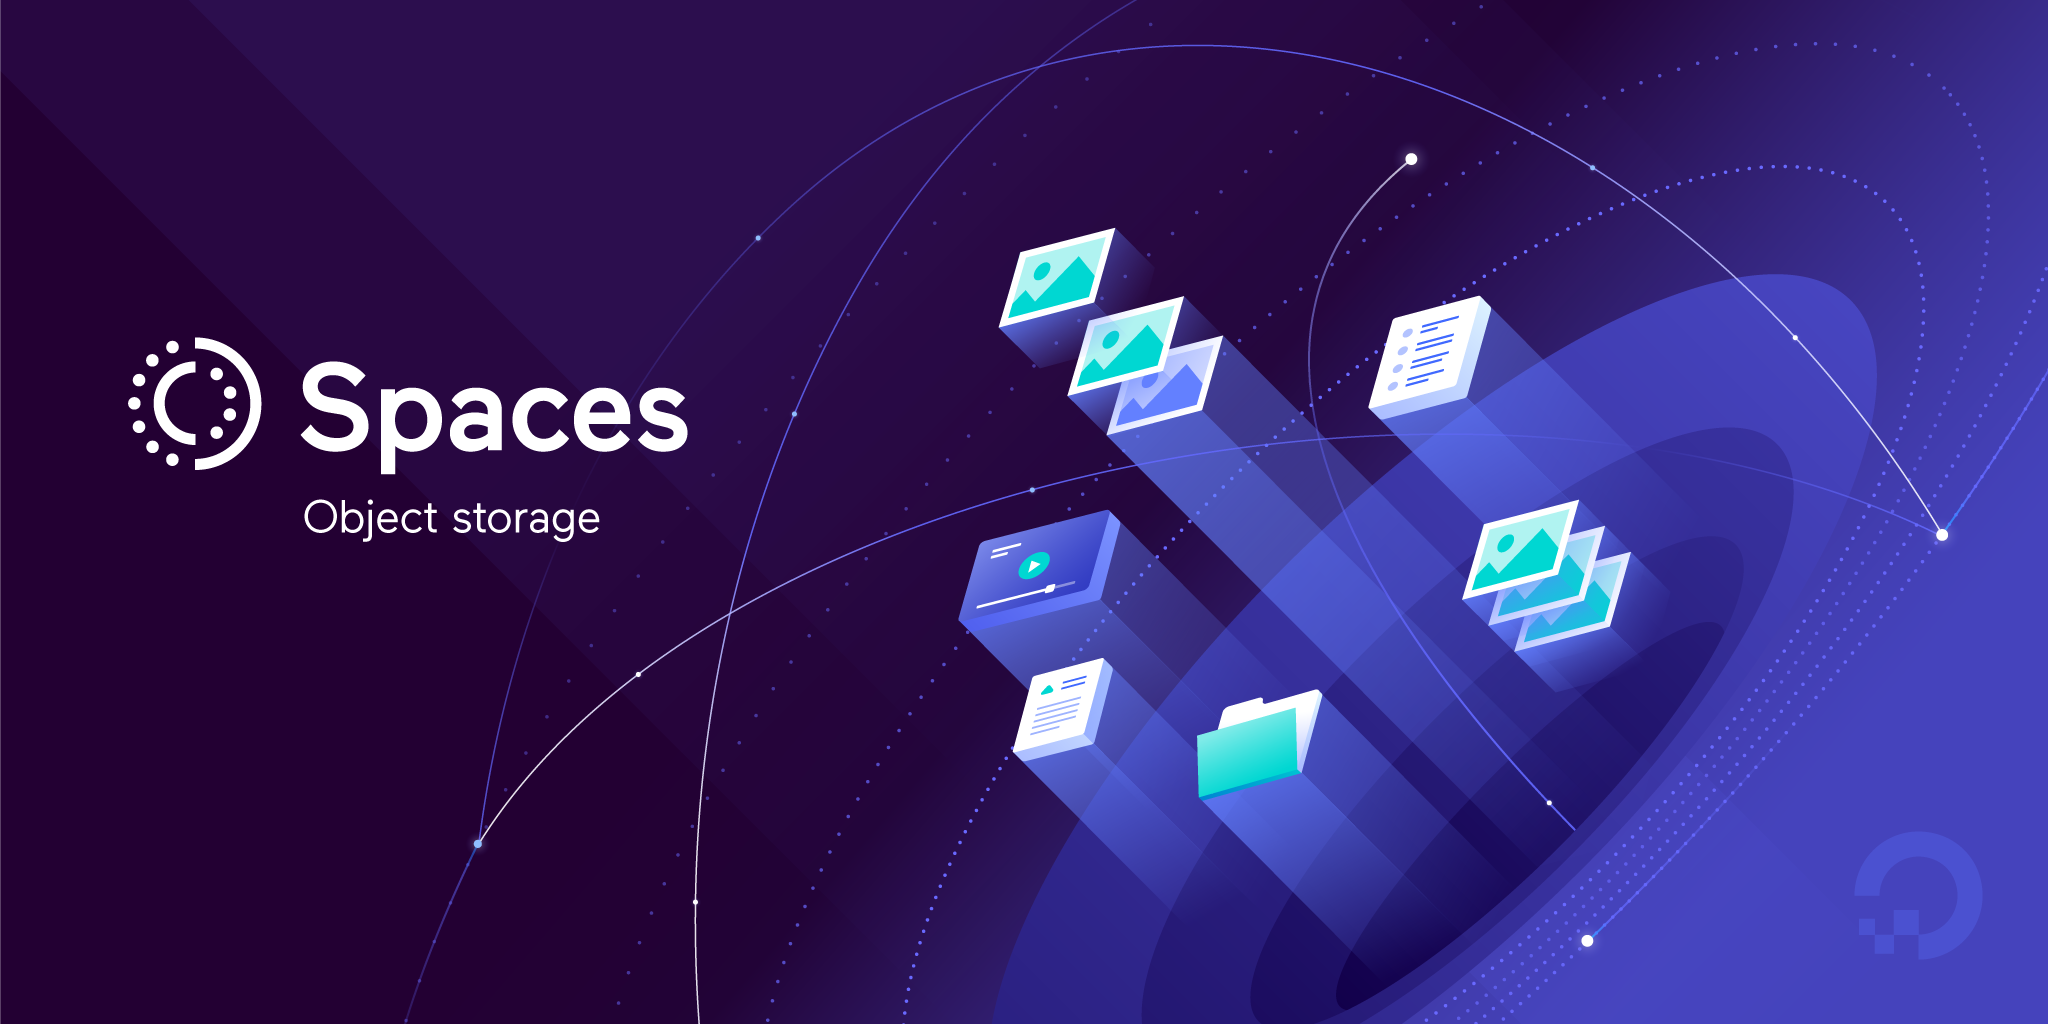 Spaces on DigitalOcean - Beautifully simple object storage